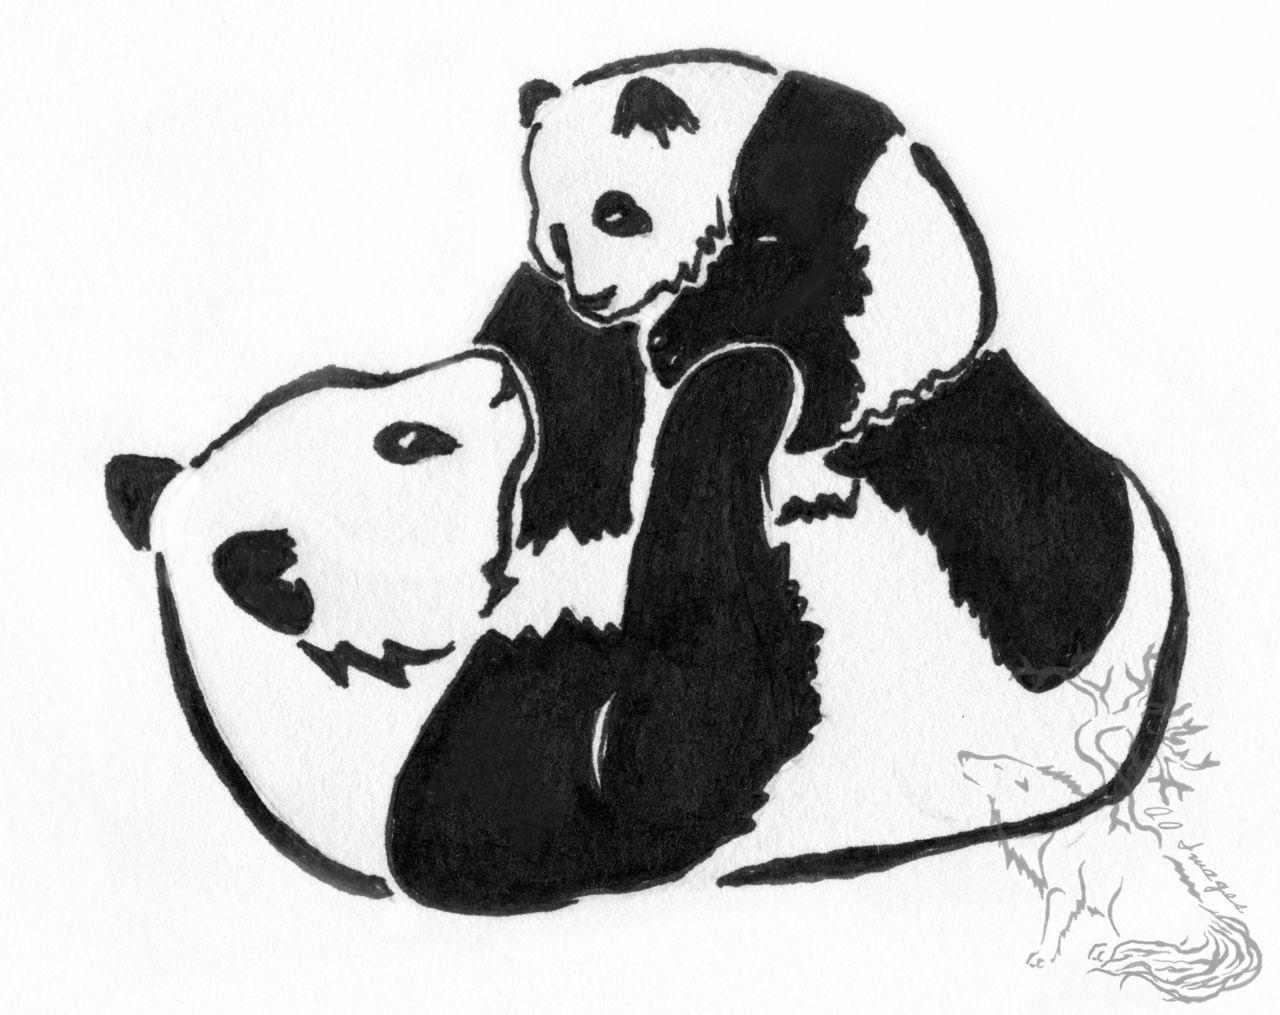 Crazy Tattoo Face: Panda Tattoo Tumblr   PANDA ❤   Pinterest ...